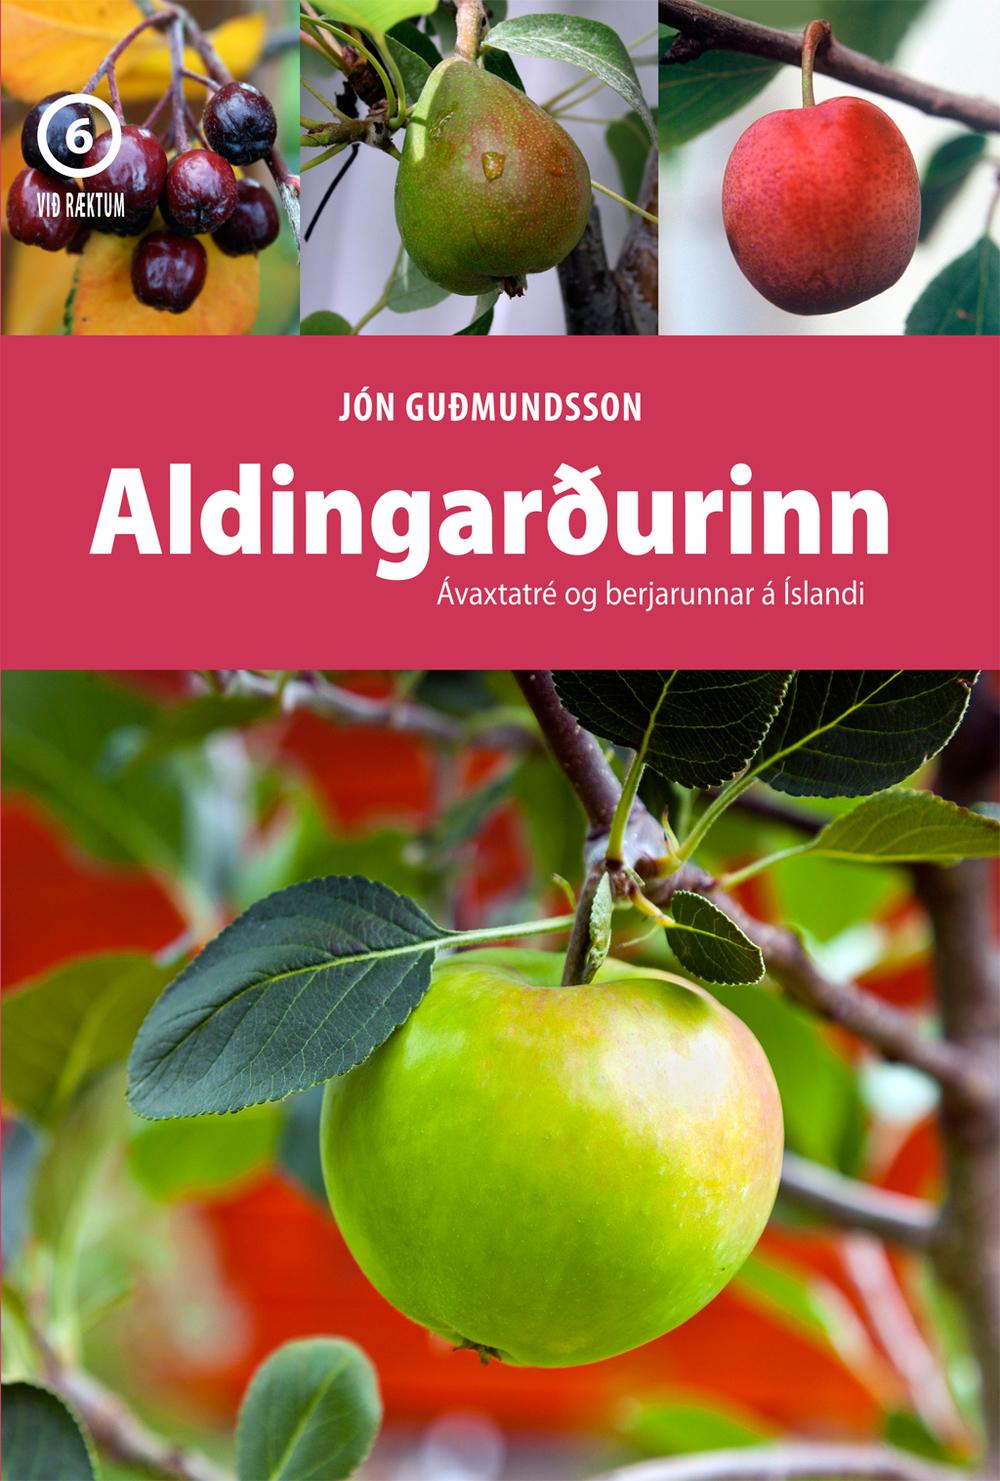 Cover aldingardur-2014-1024px.jpg